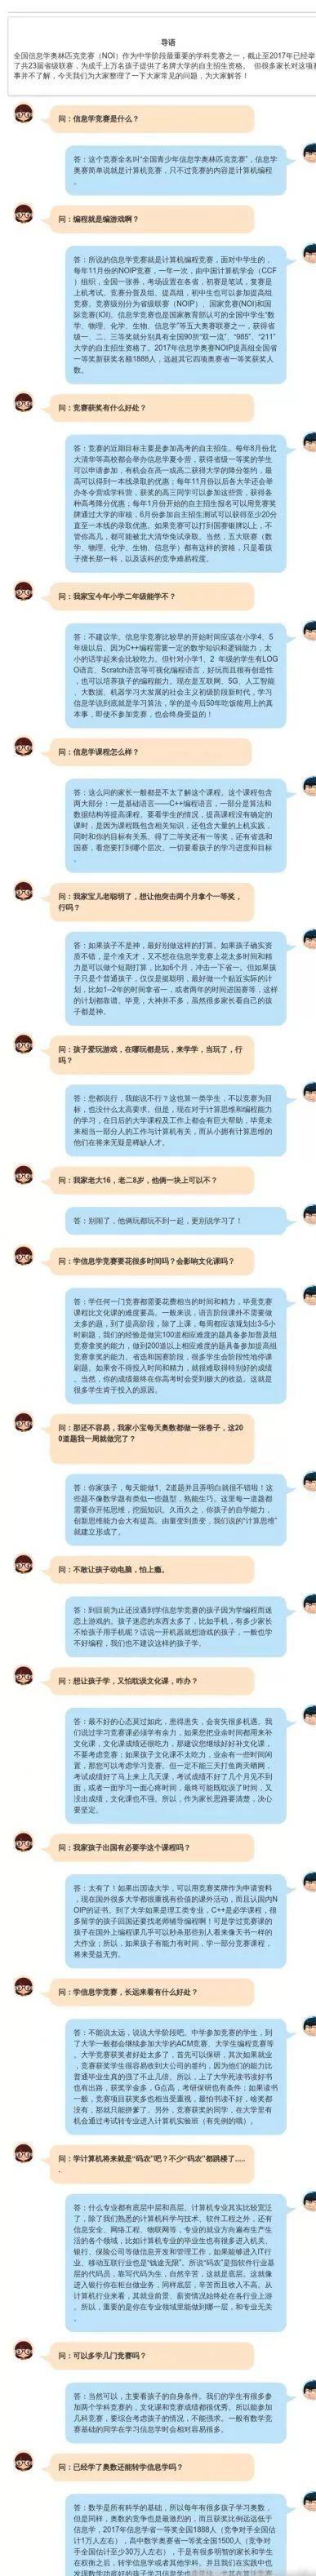 https://cdn.china-scratch.com/timg/190426/111031K31-1.jpg